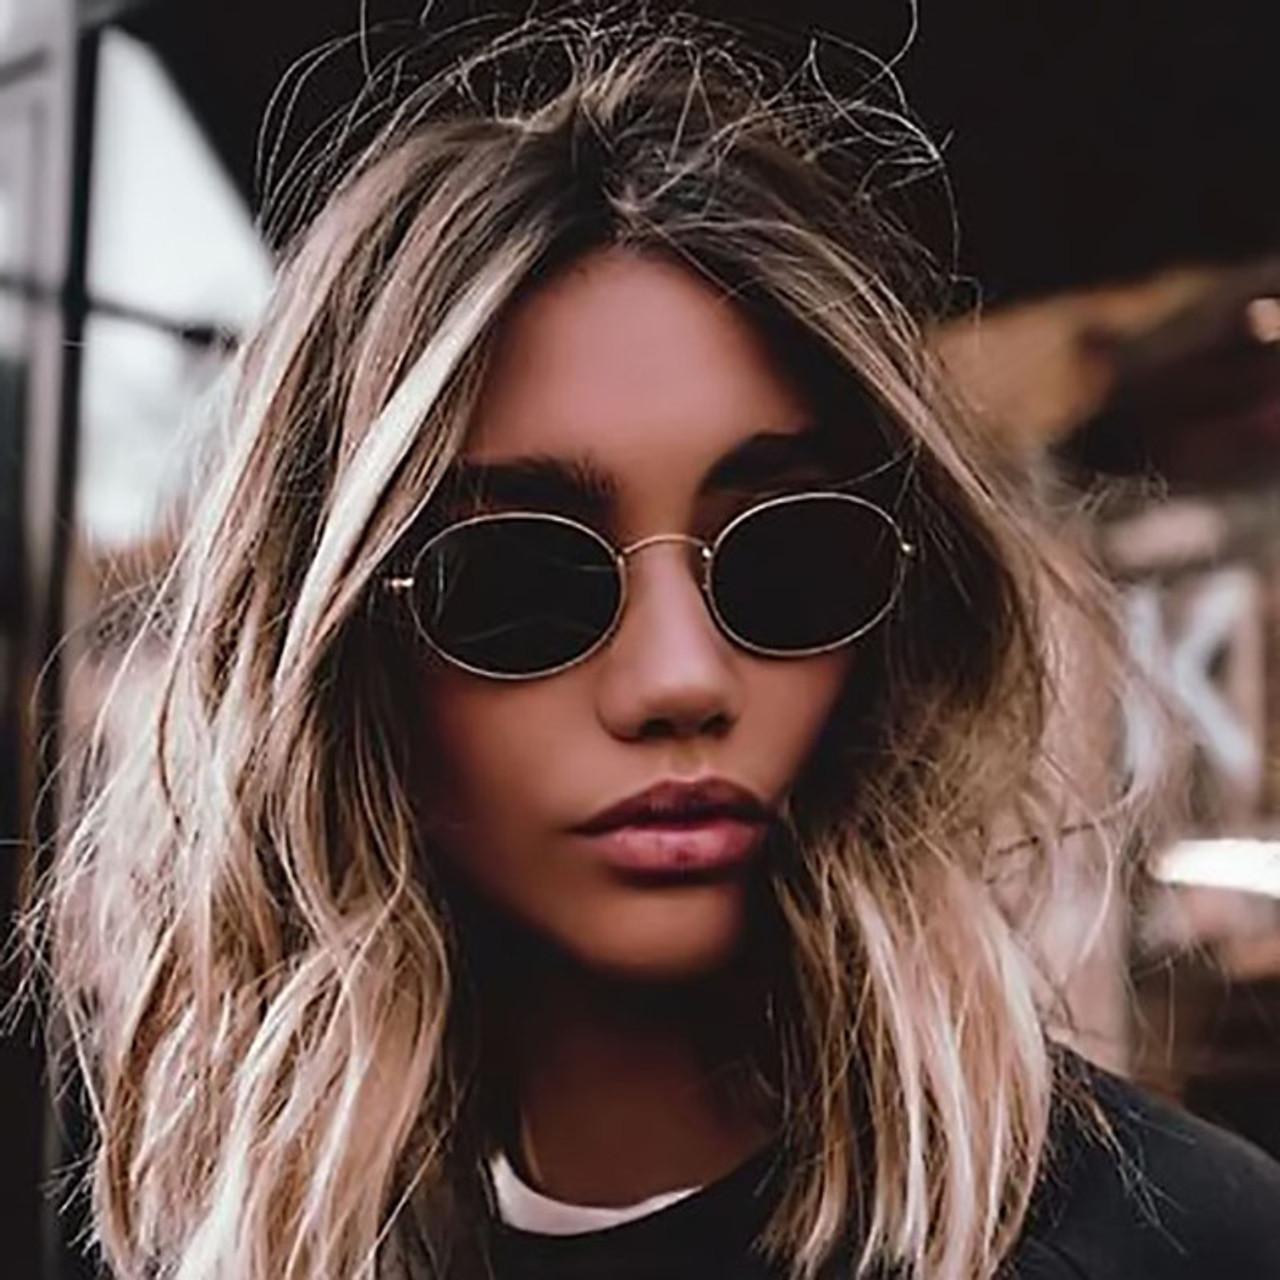 39aefb5f5 Fashion Women Sunglasses 2018 Famous Oval Sun Glasses Luxury Brand Metal Round  Frames Black Small Cheap Eyewear Oculos